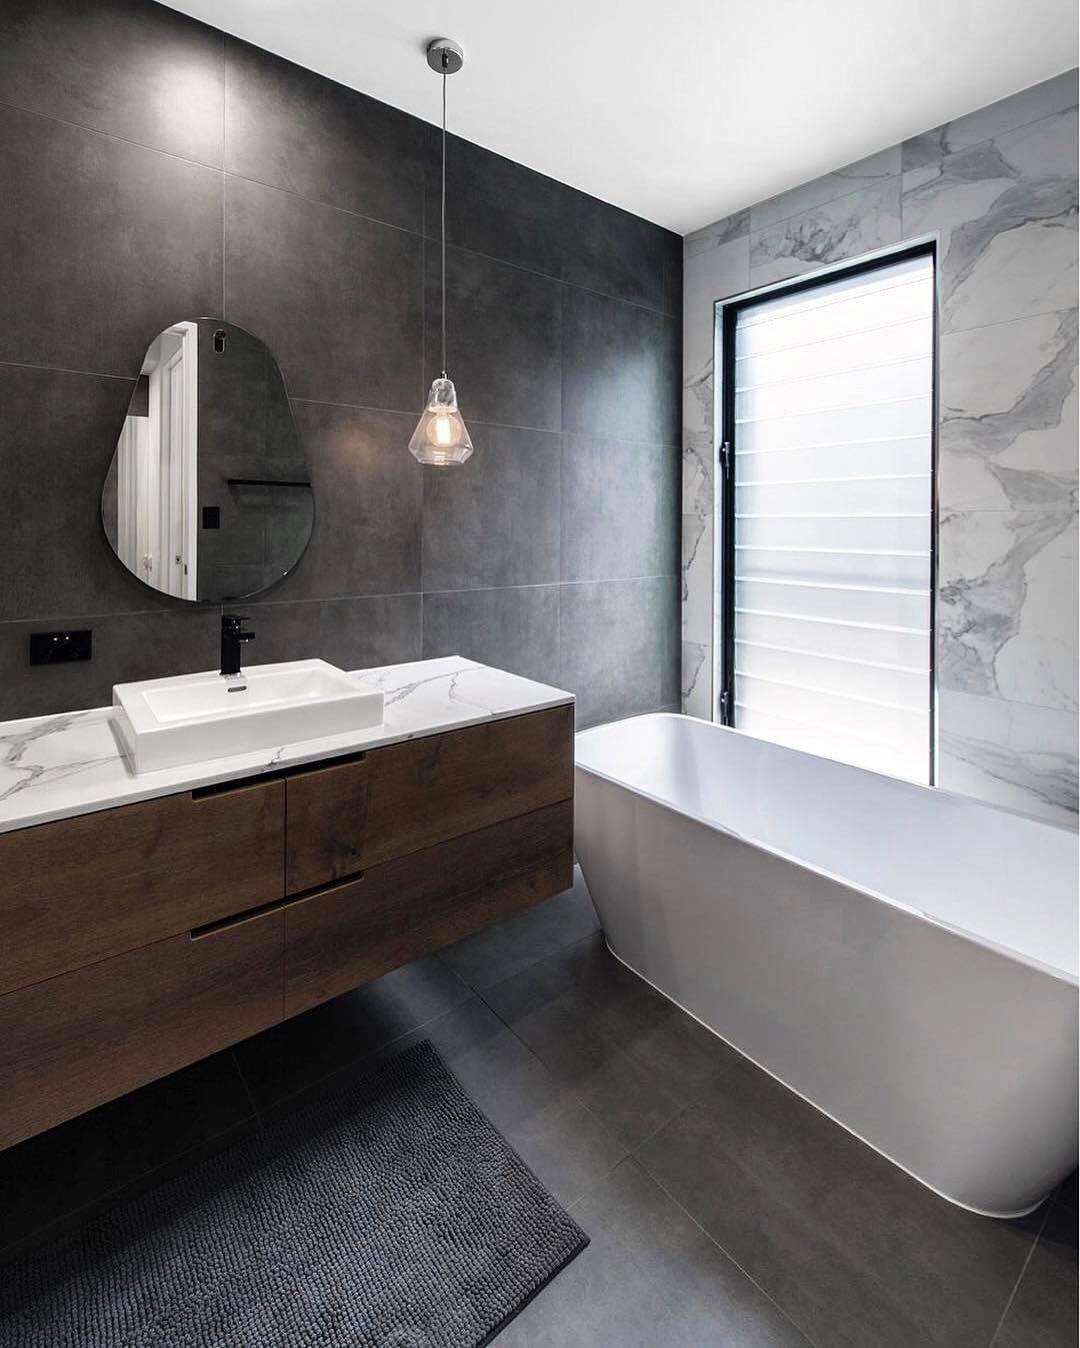 Dark & dreamy bathroom designed by the talented